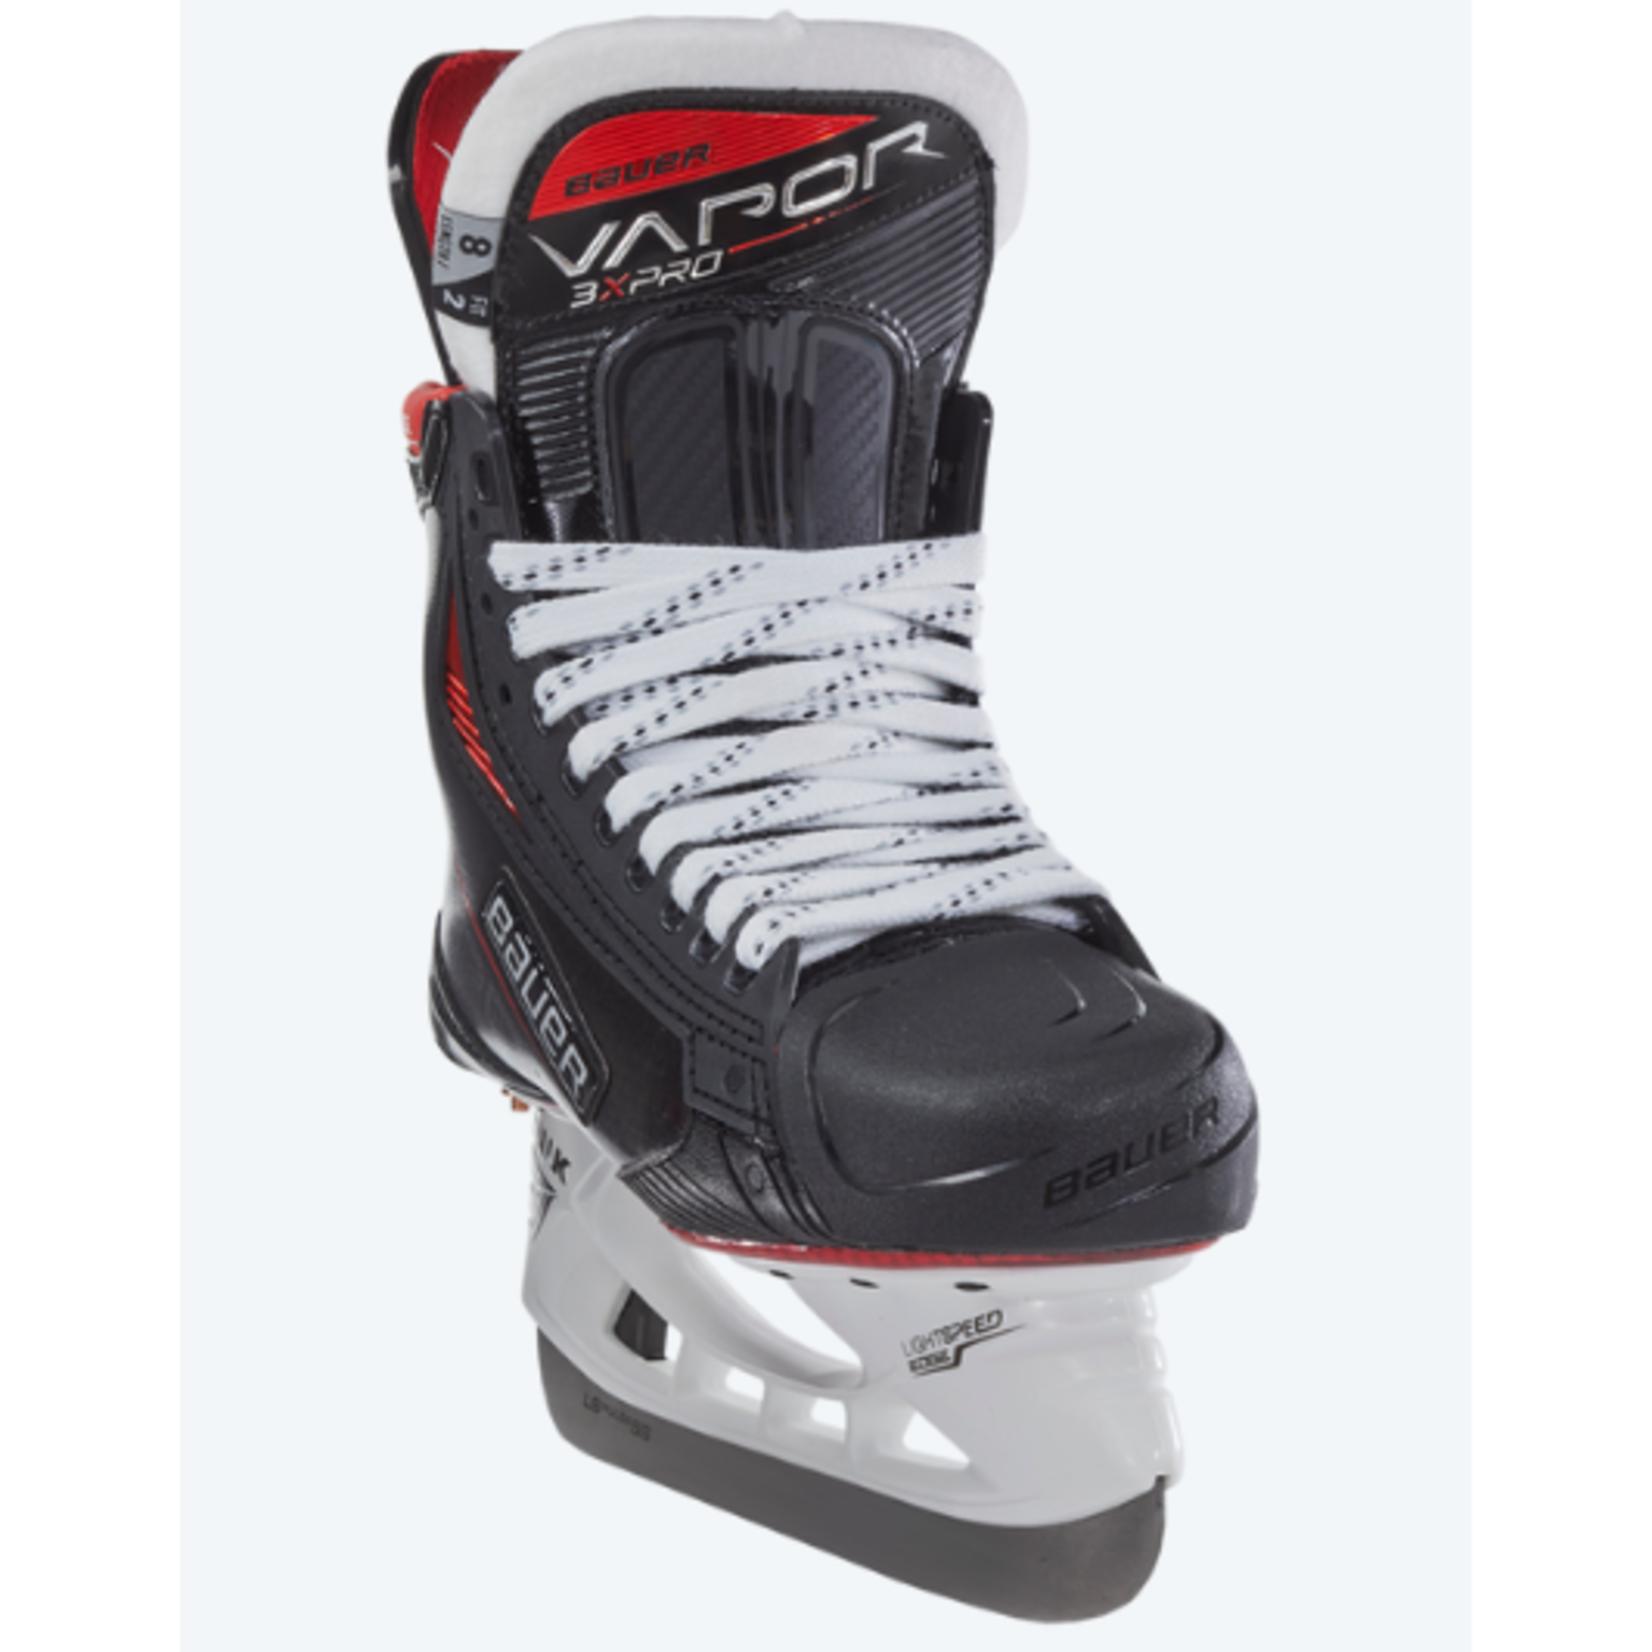 S21 BAUER Vapor 3X Pro Skates IN